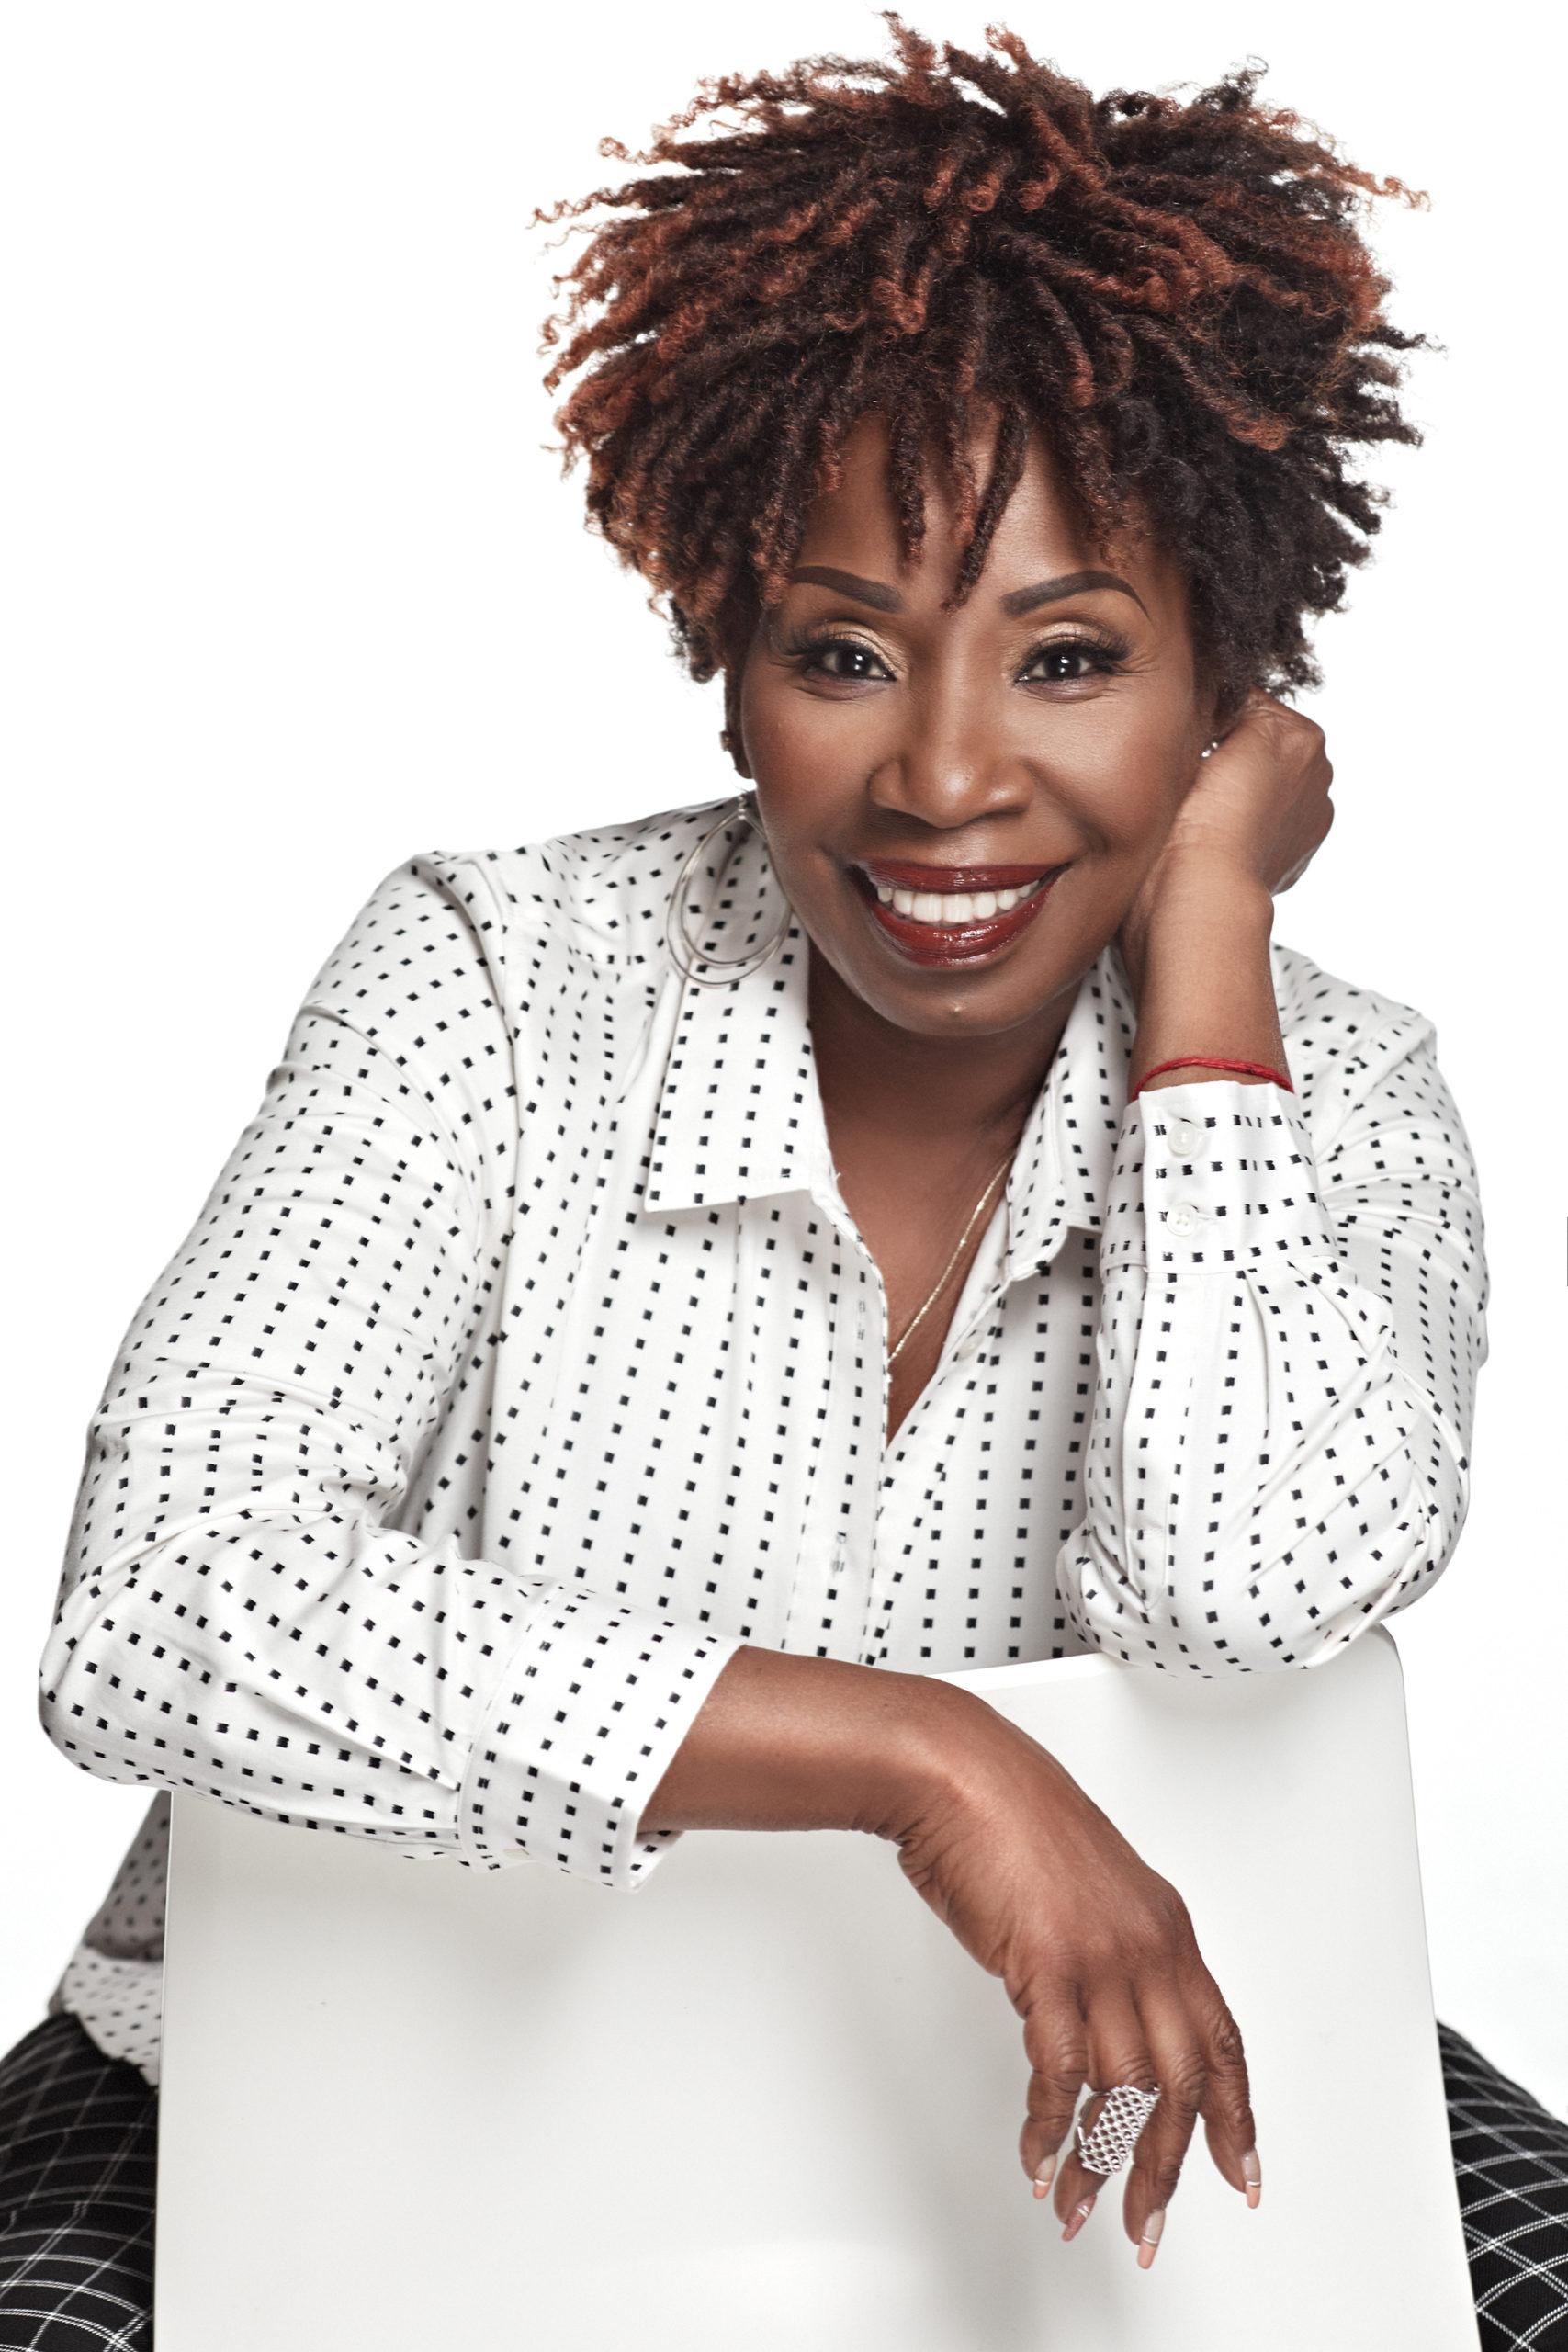 Iyanla Vanzant sitting and smiling in white polka dotted shirt